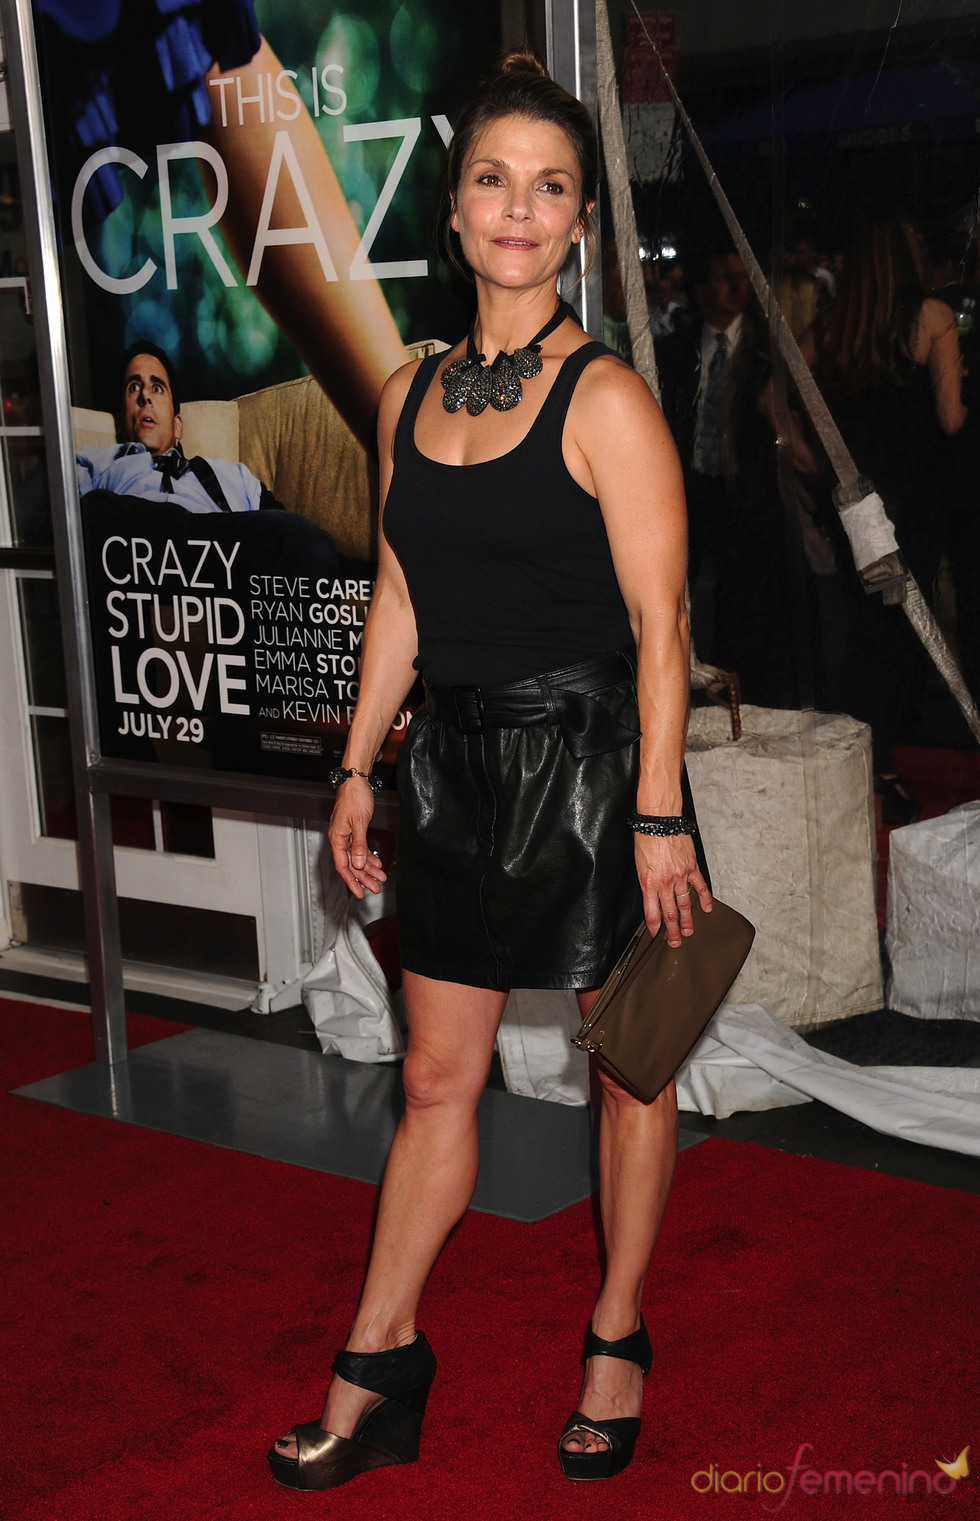 Heather Headley,Edith Atwater XXX movies Carroll Borland,Kristin Lehman